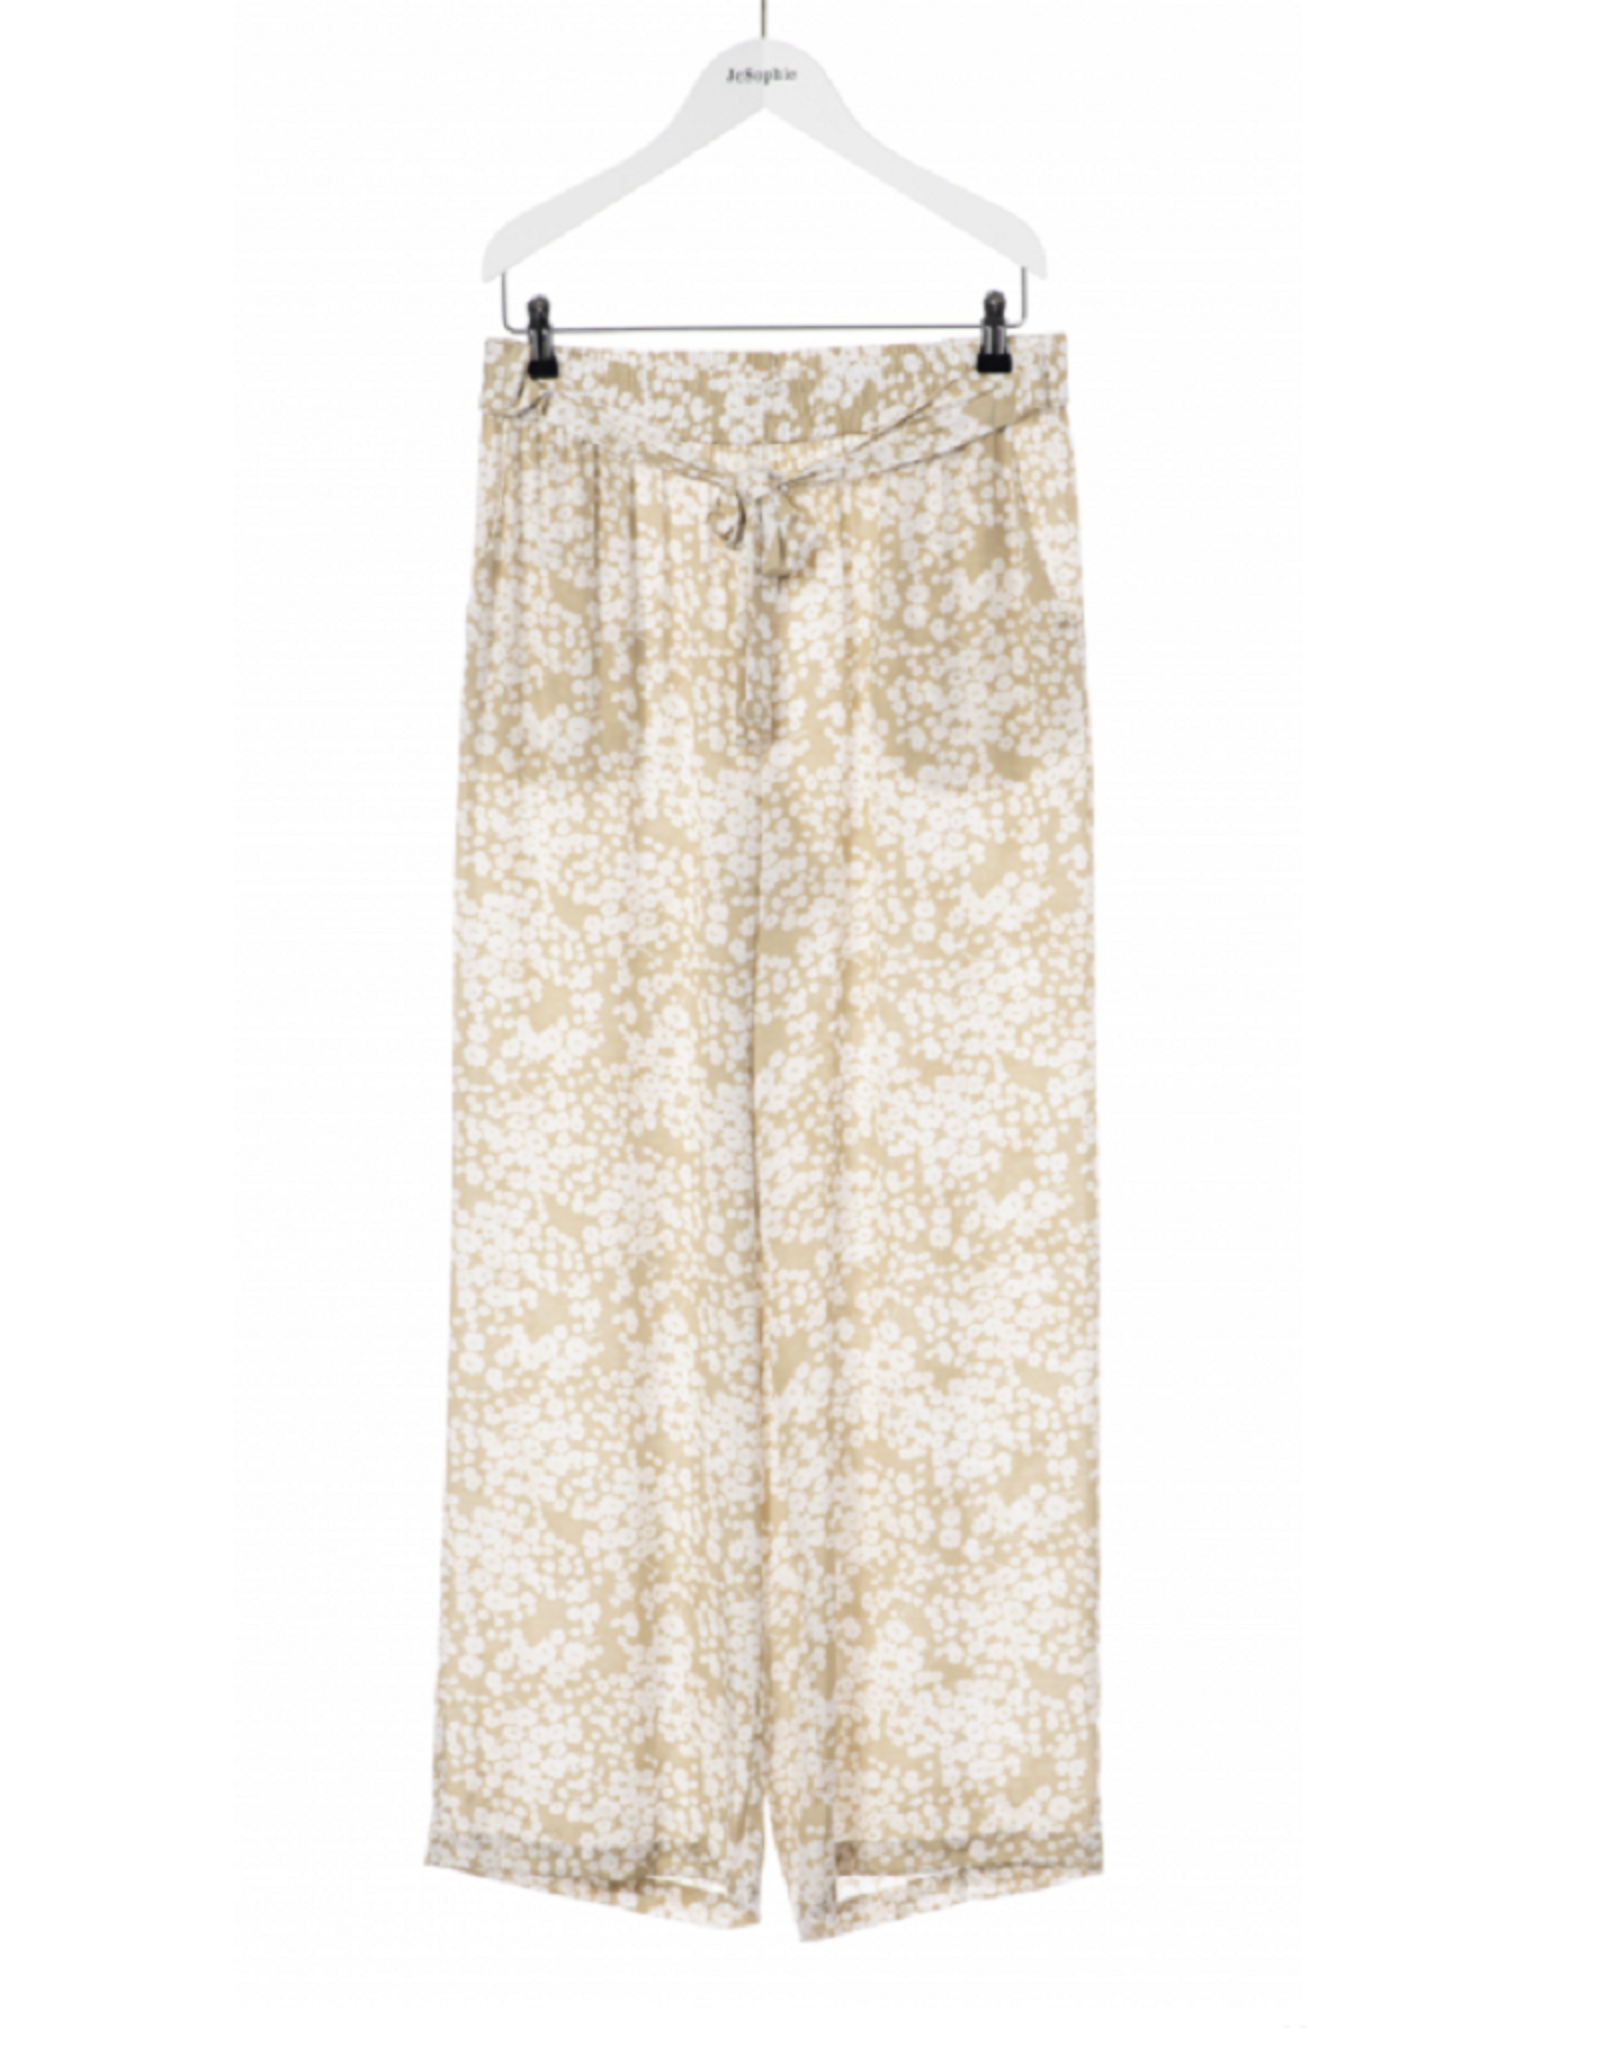 JcSophie JcSophie pantalon Holly sant print